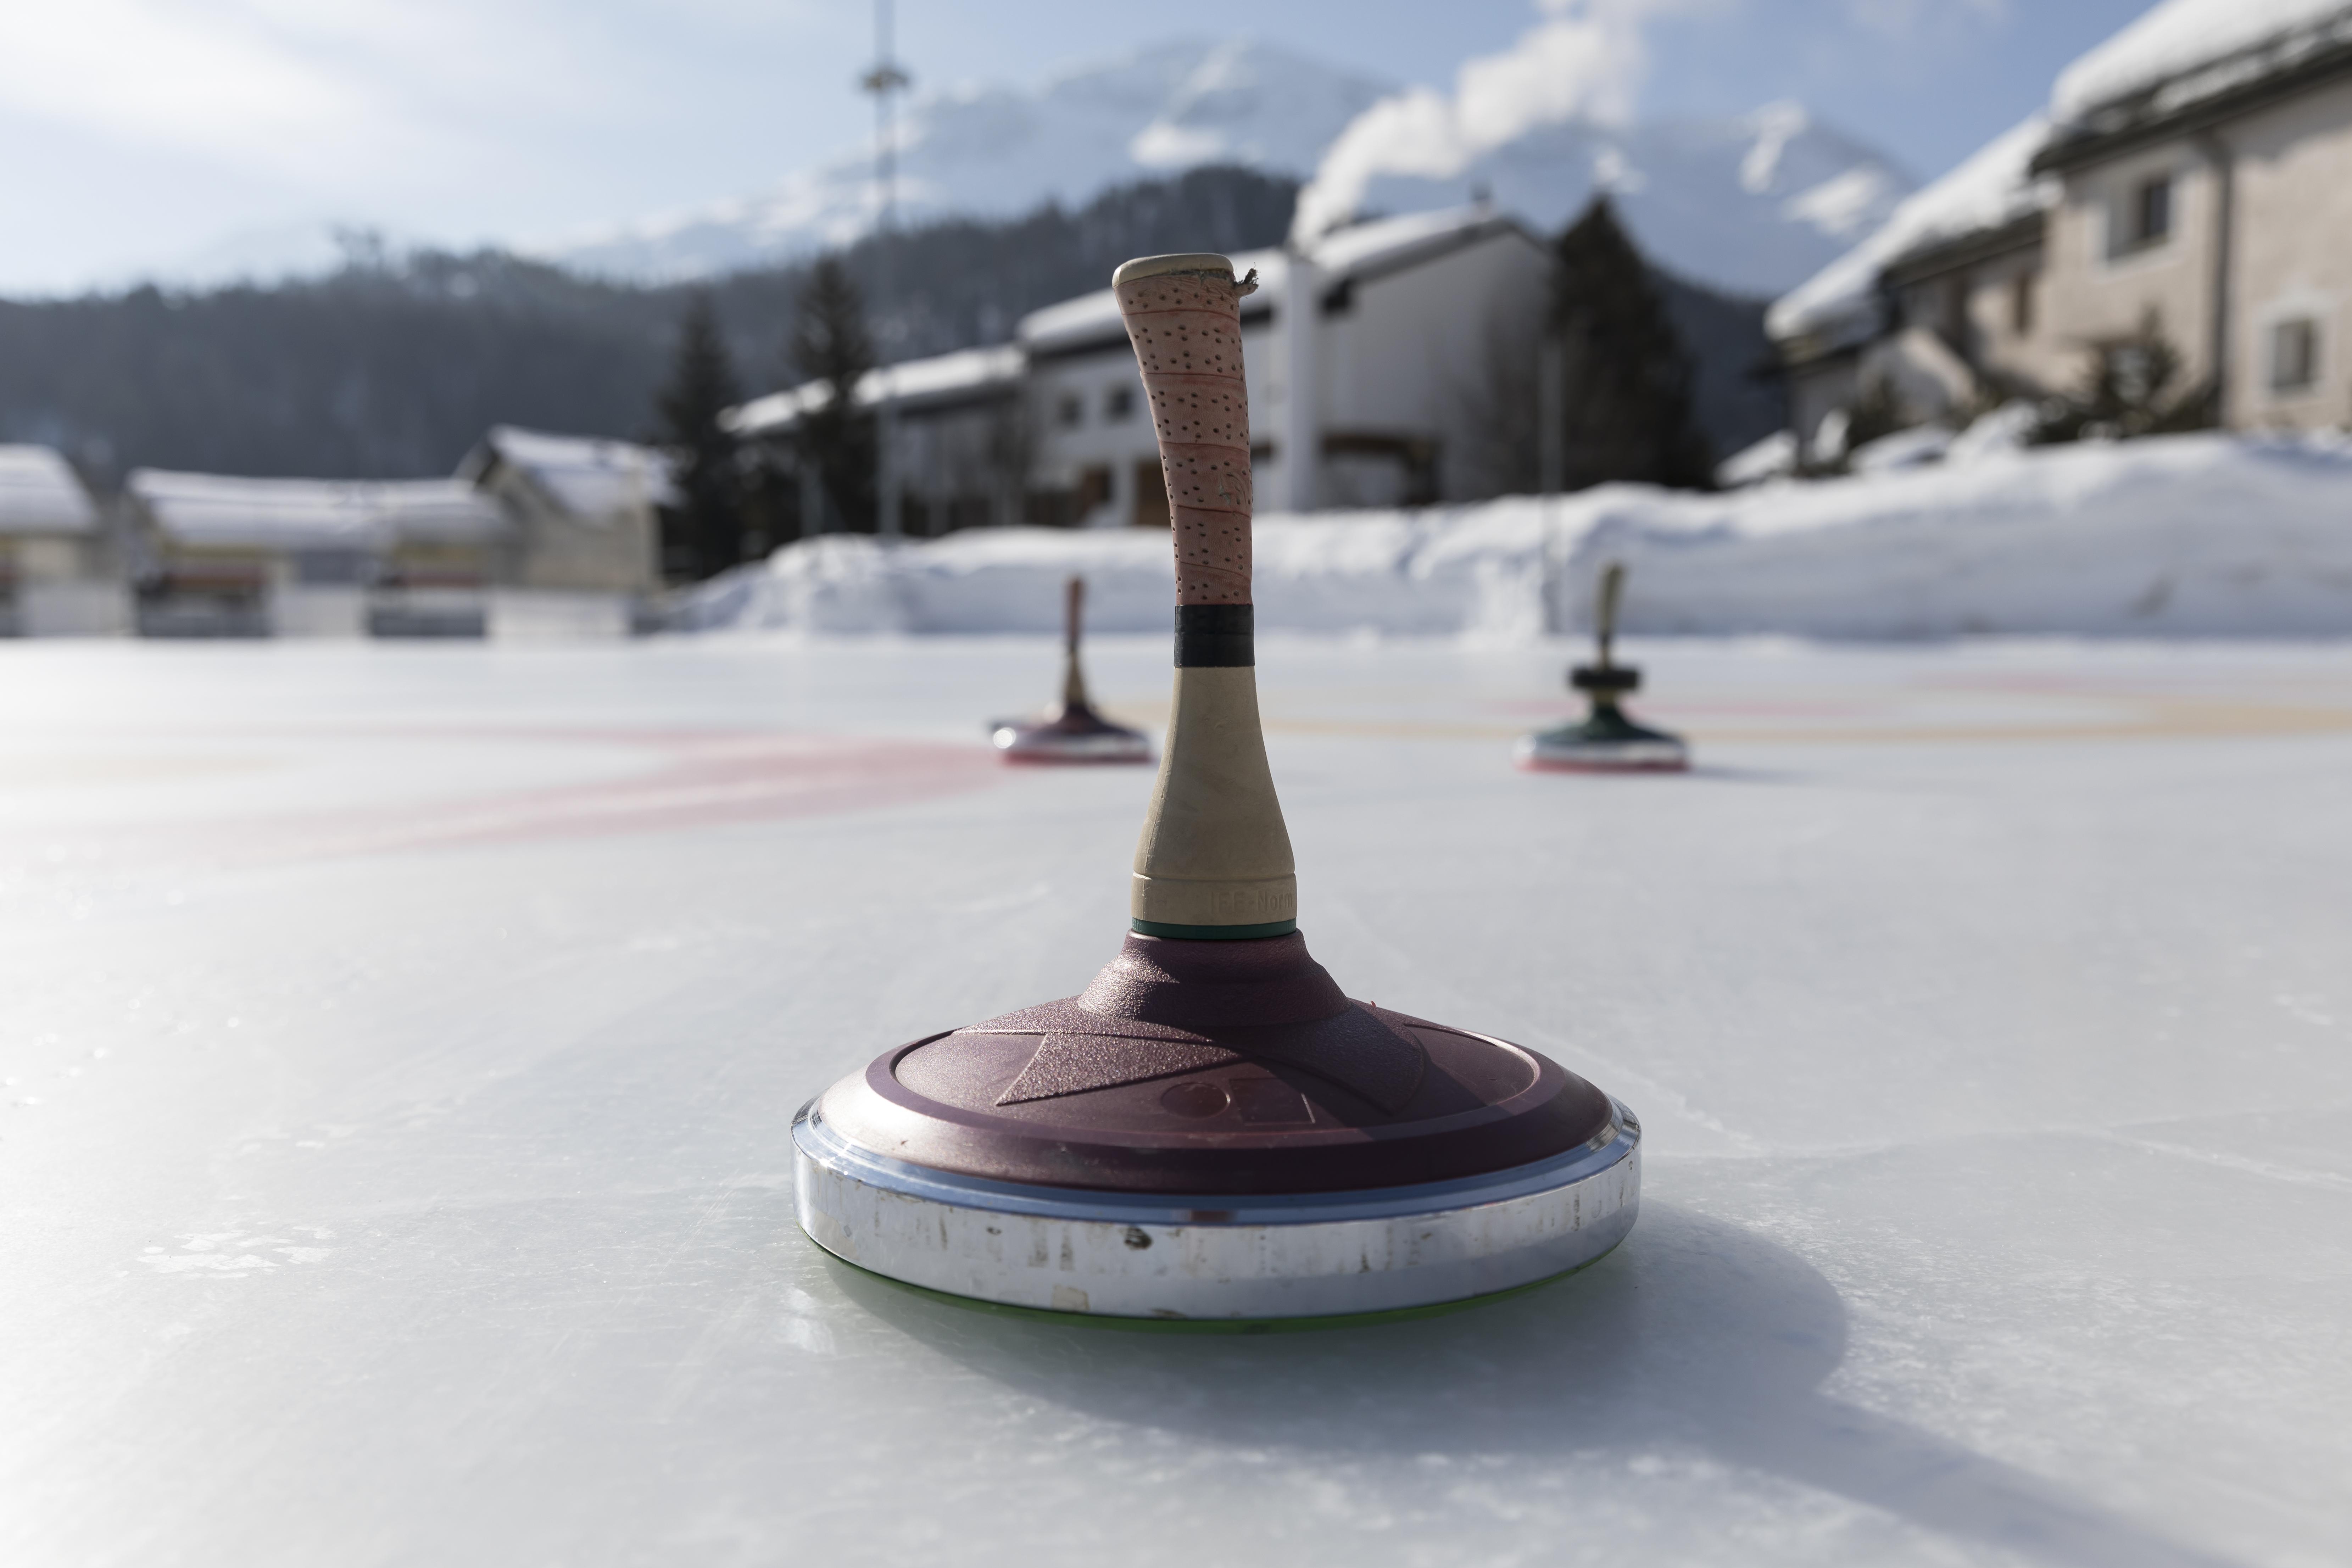 Celerina ice rink Slide 1